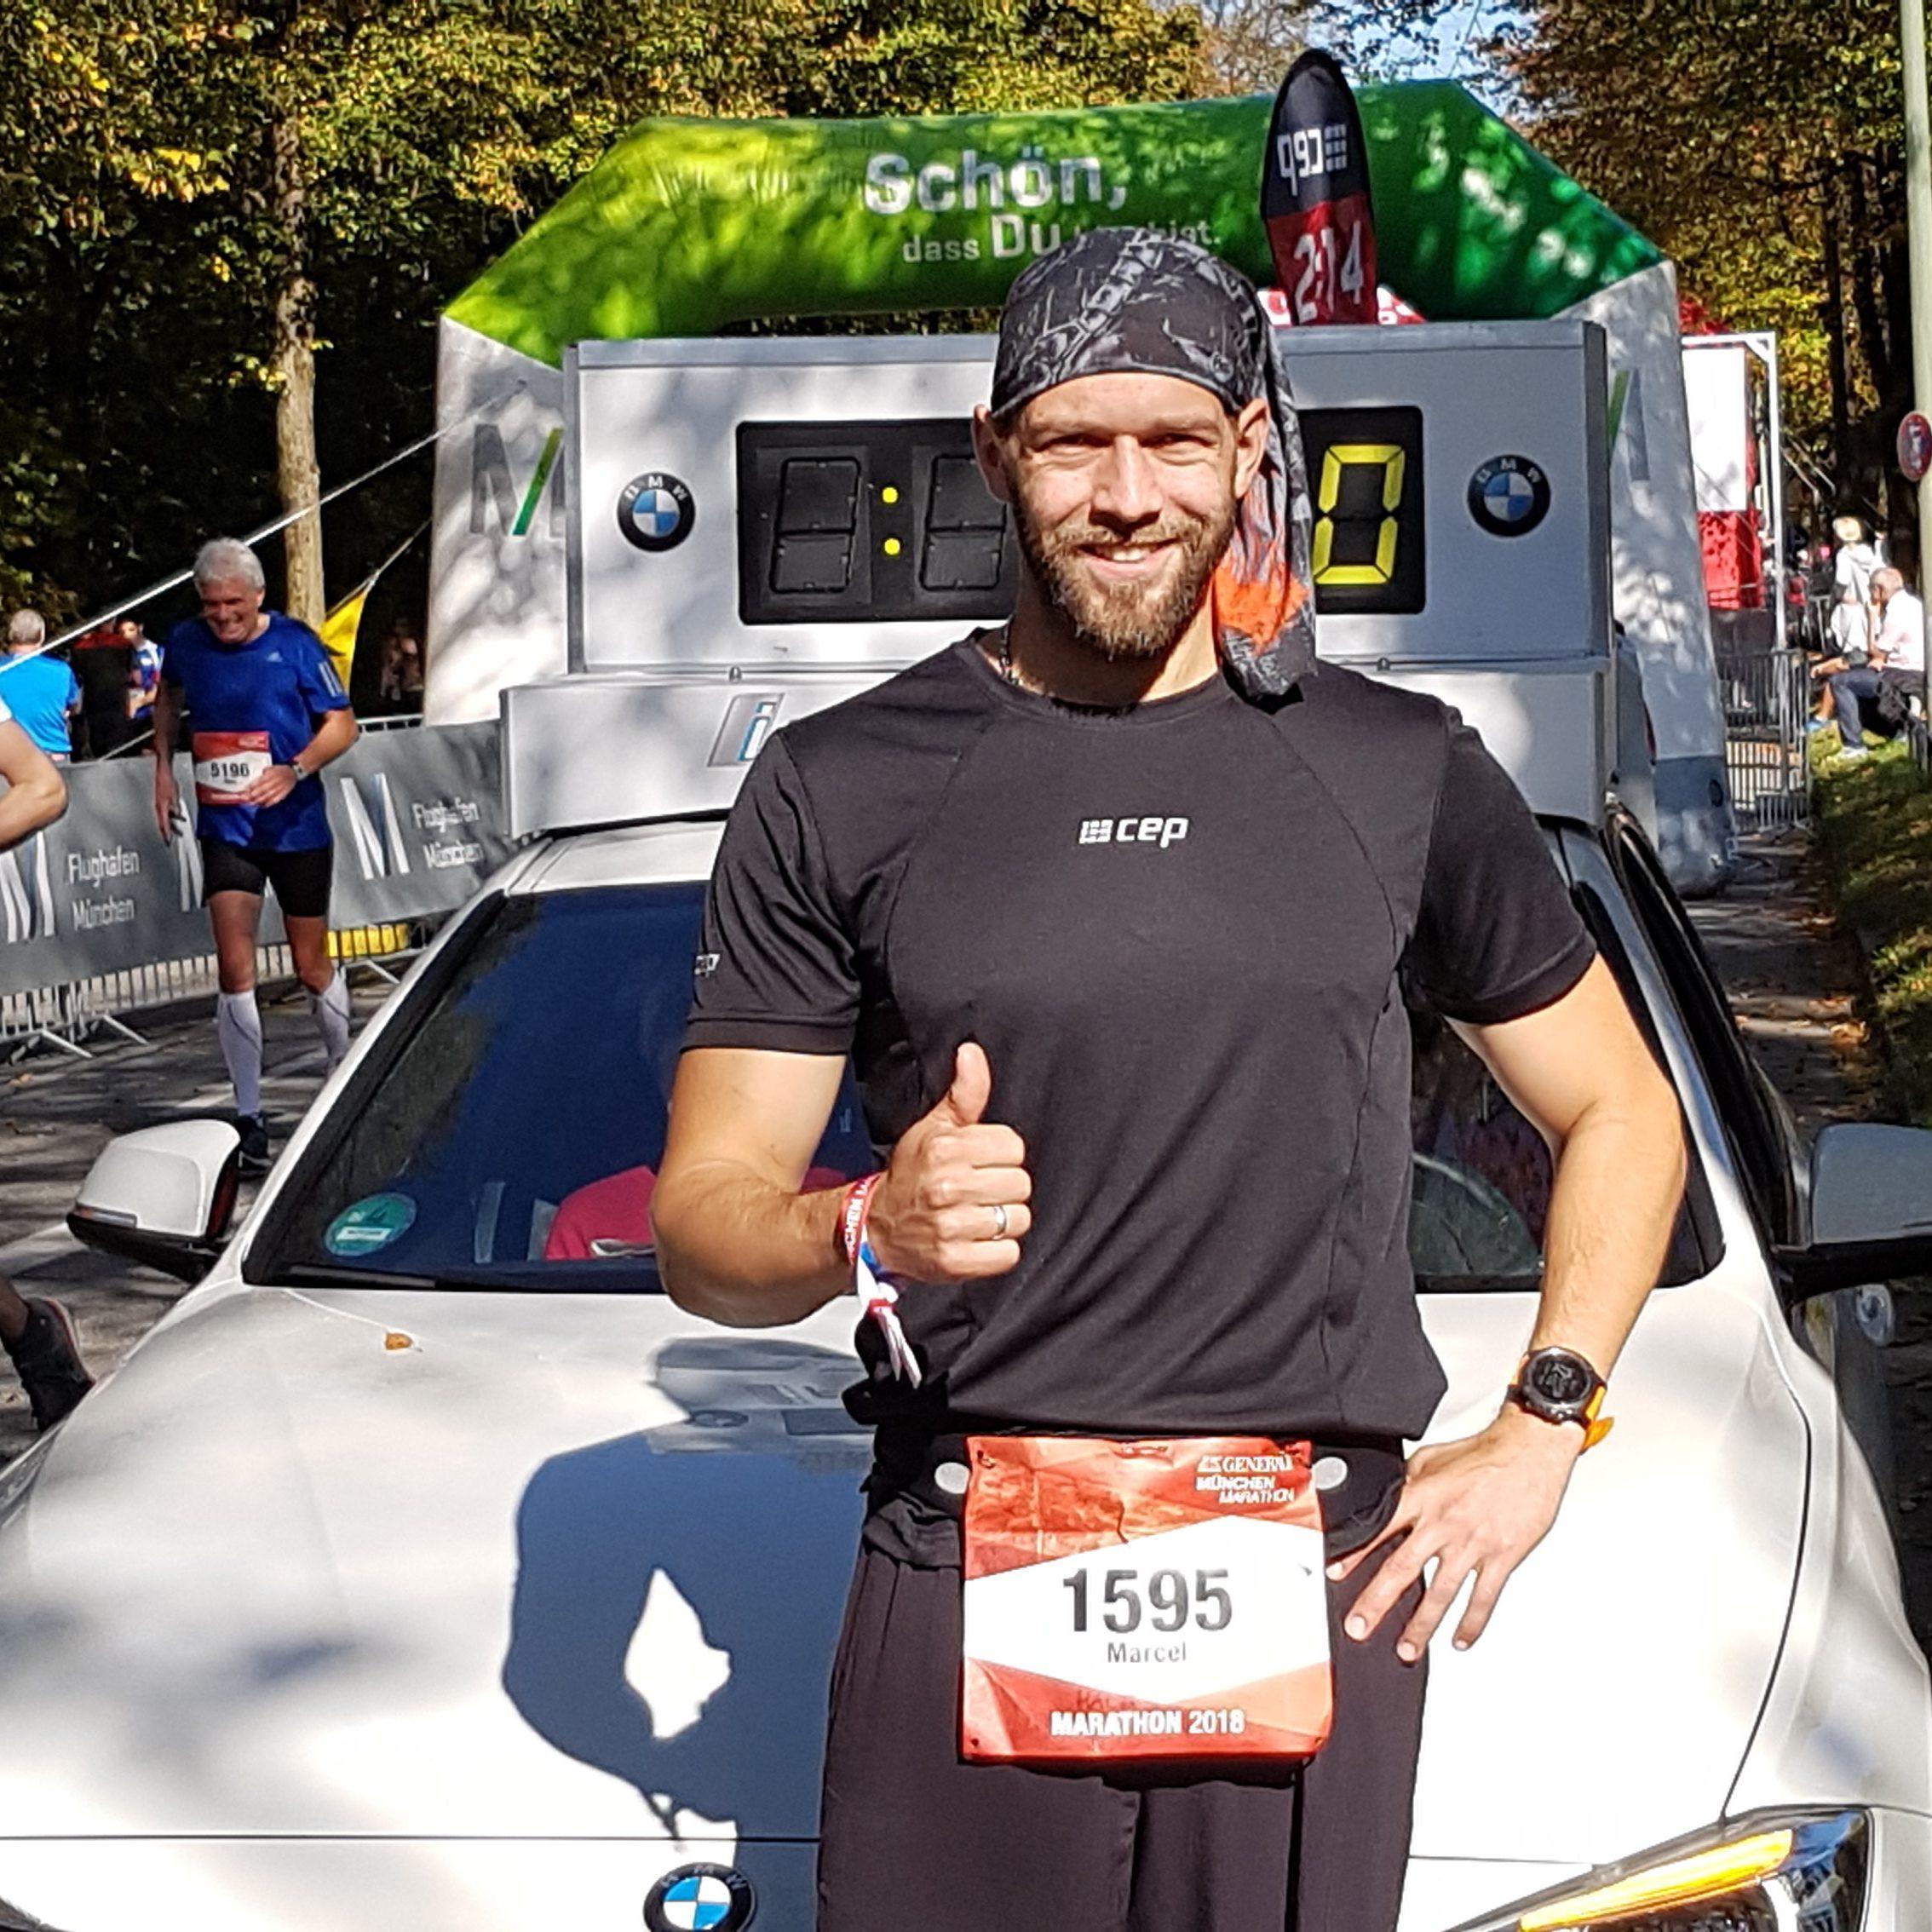 Mainova Frankfurt Marathon Pacemaker 20181014 120248 21